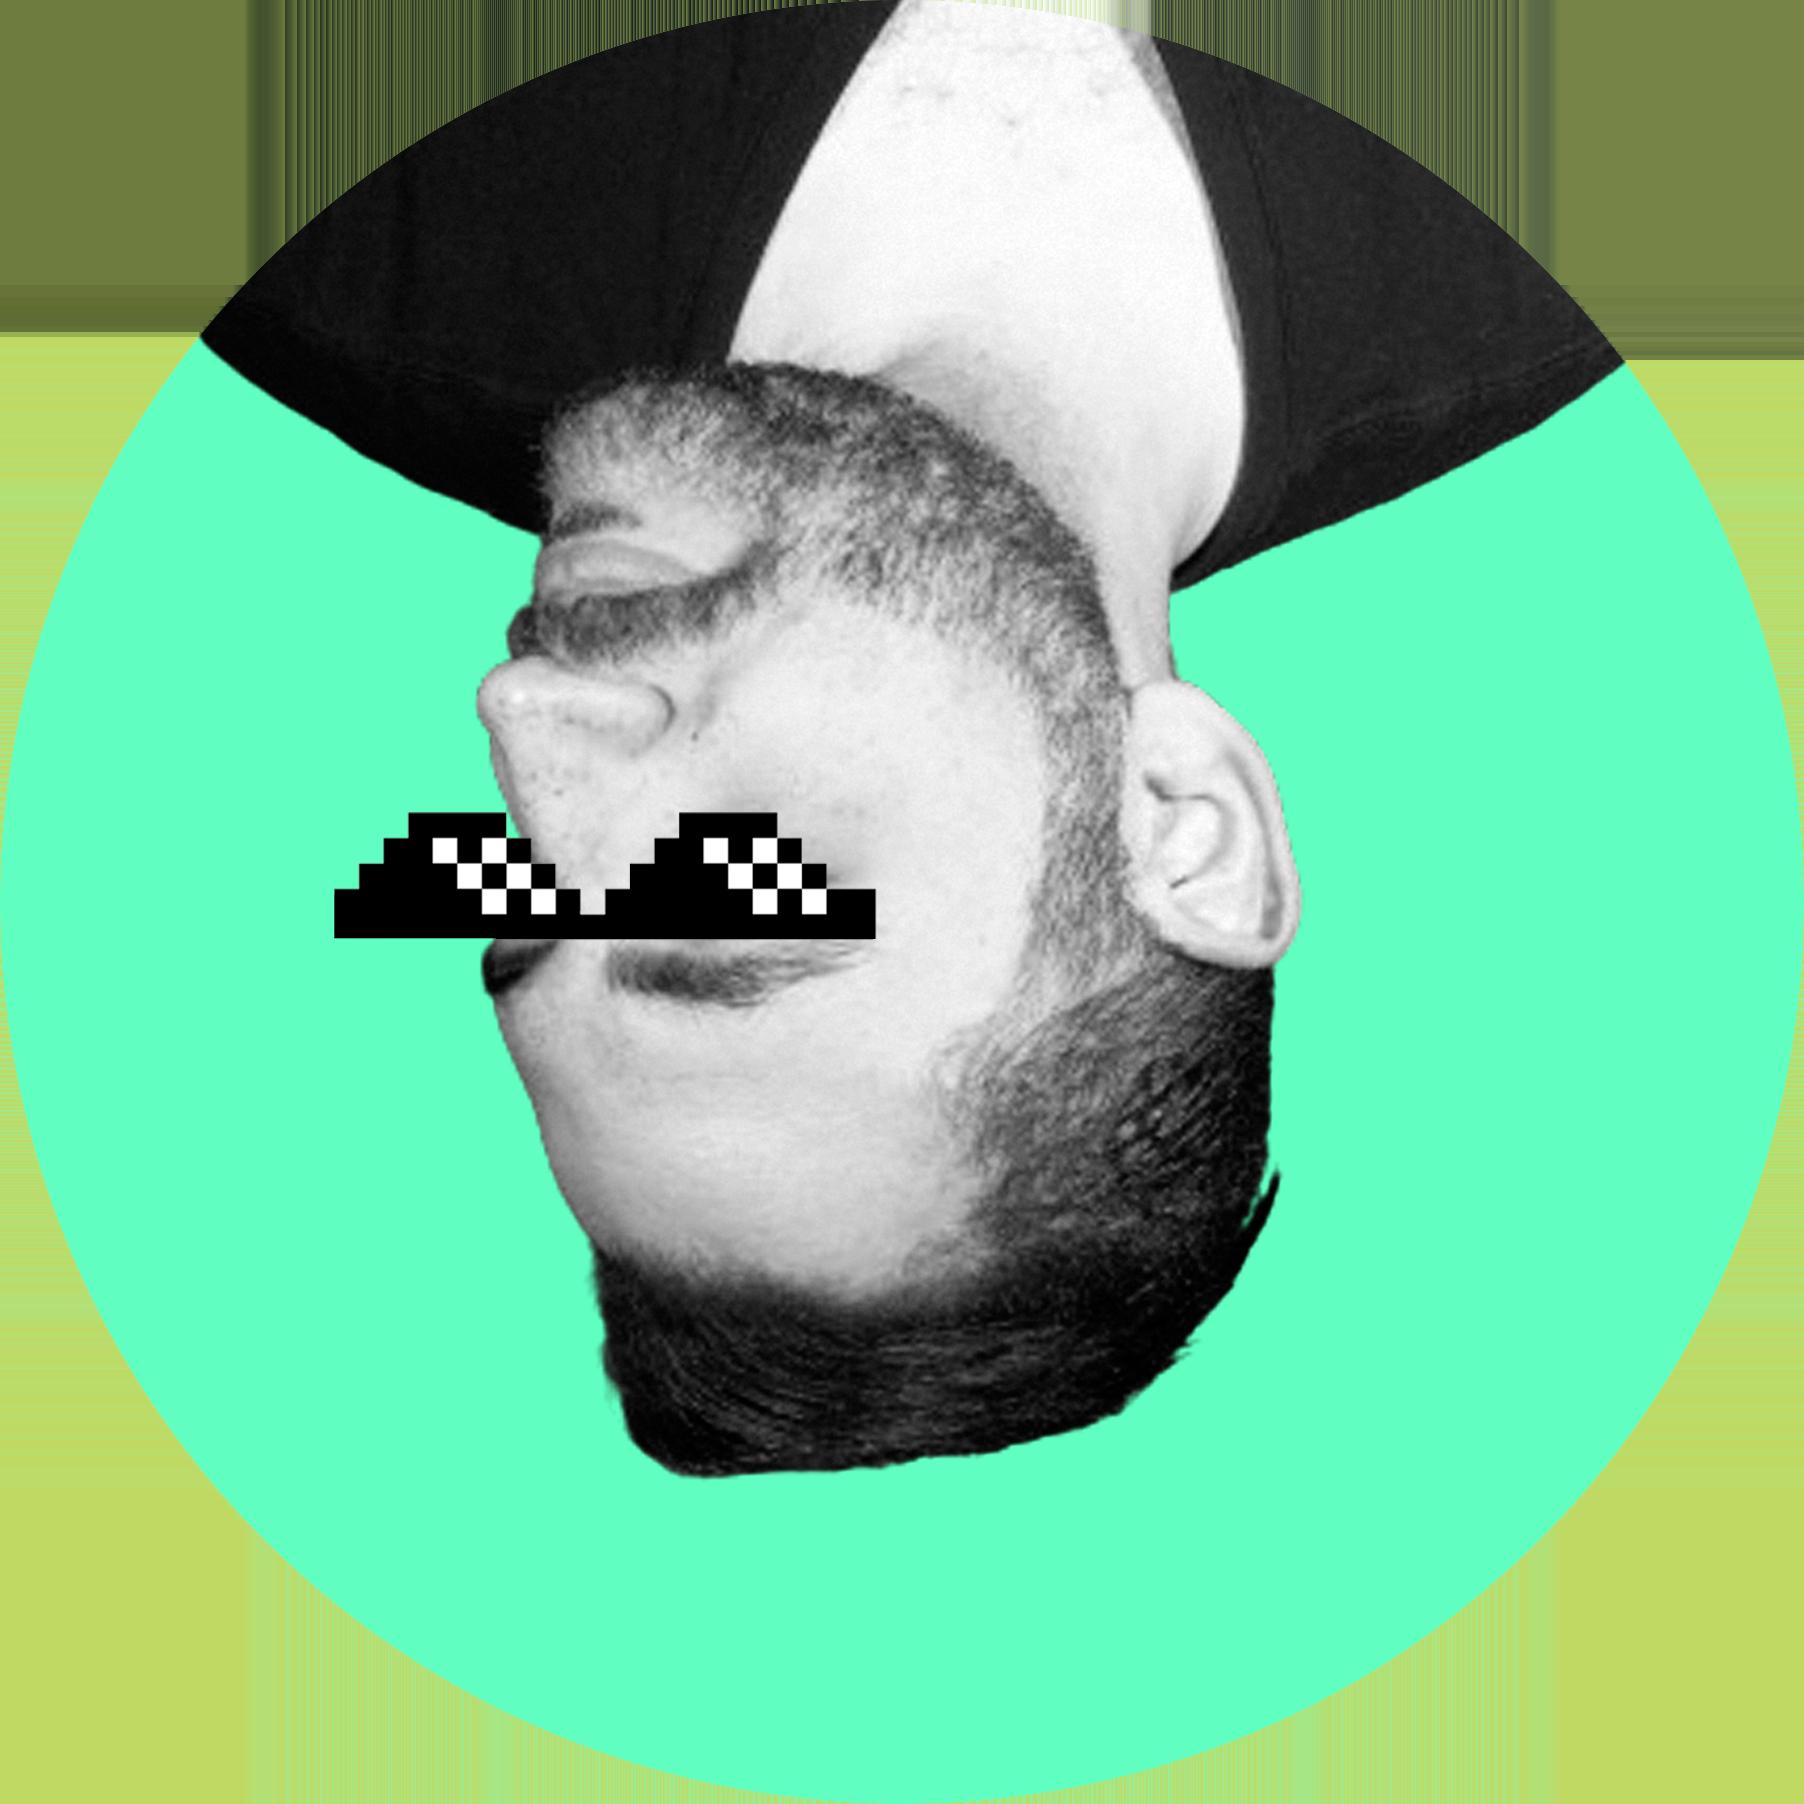 https://oteek.com/wp-content/uploads/2020/10/SaadNew_Circle.png